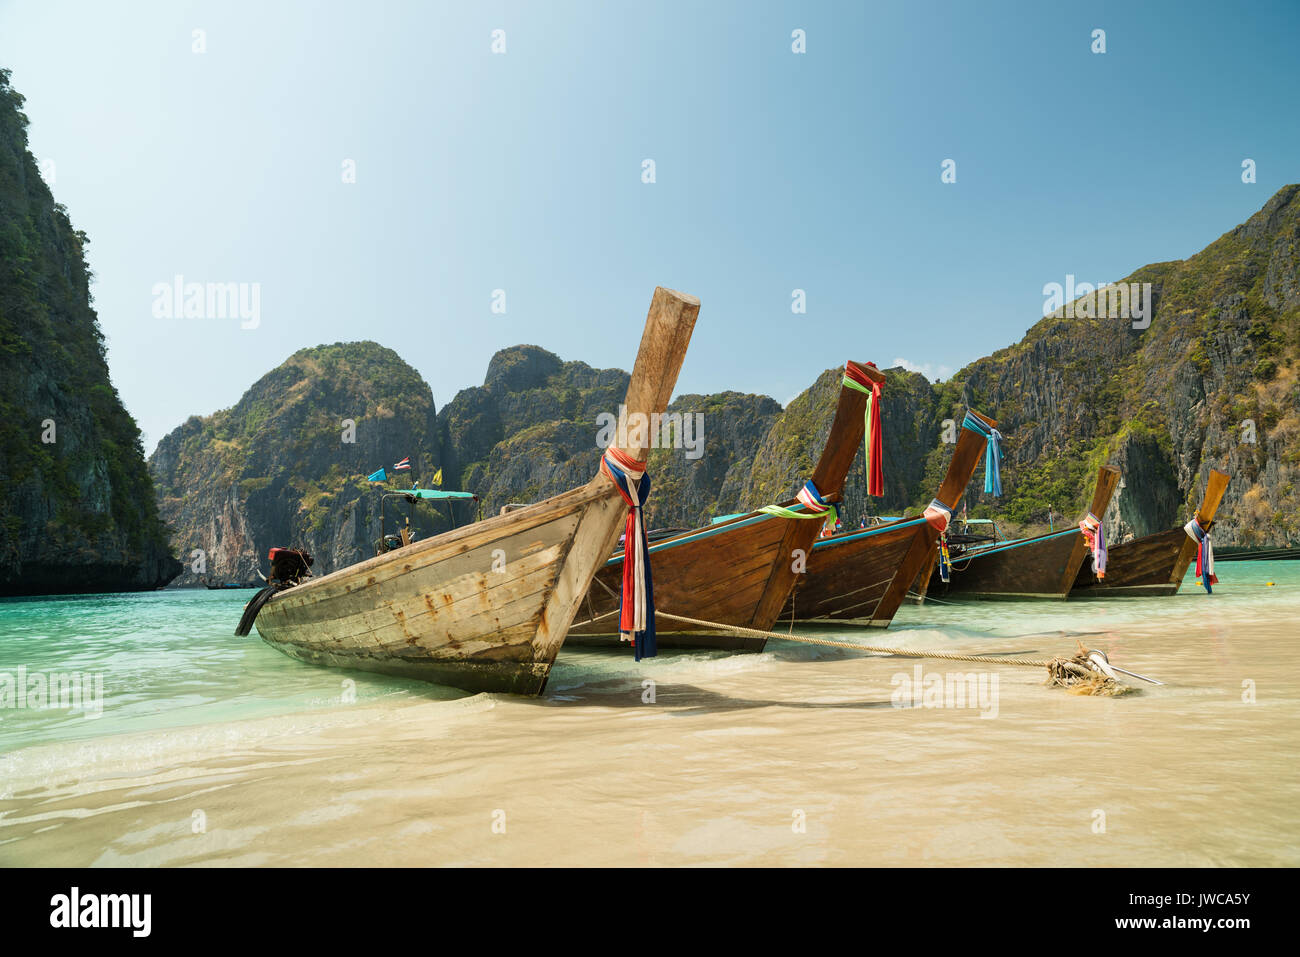 Koh Phi Phi Island - Thailand - Stock Image